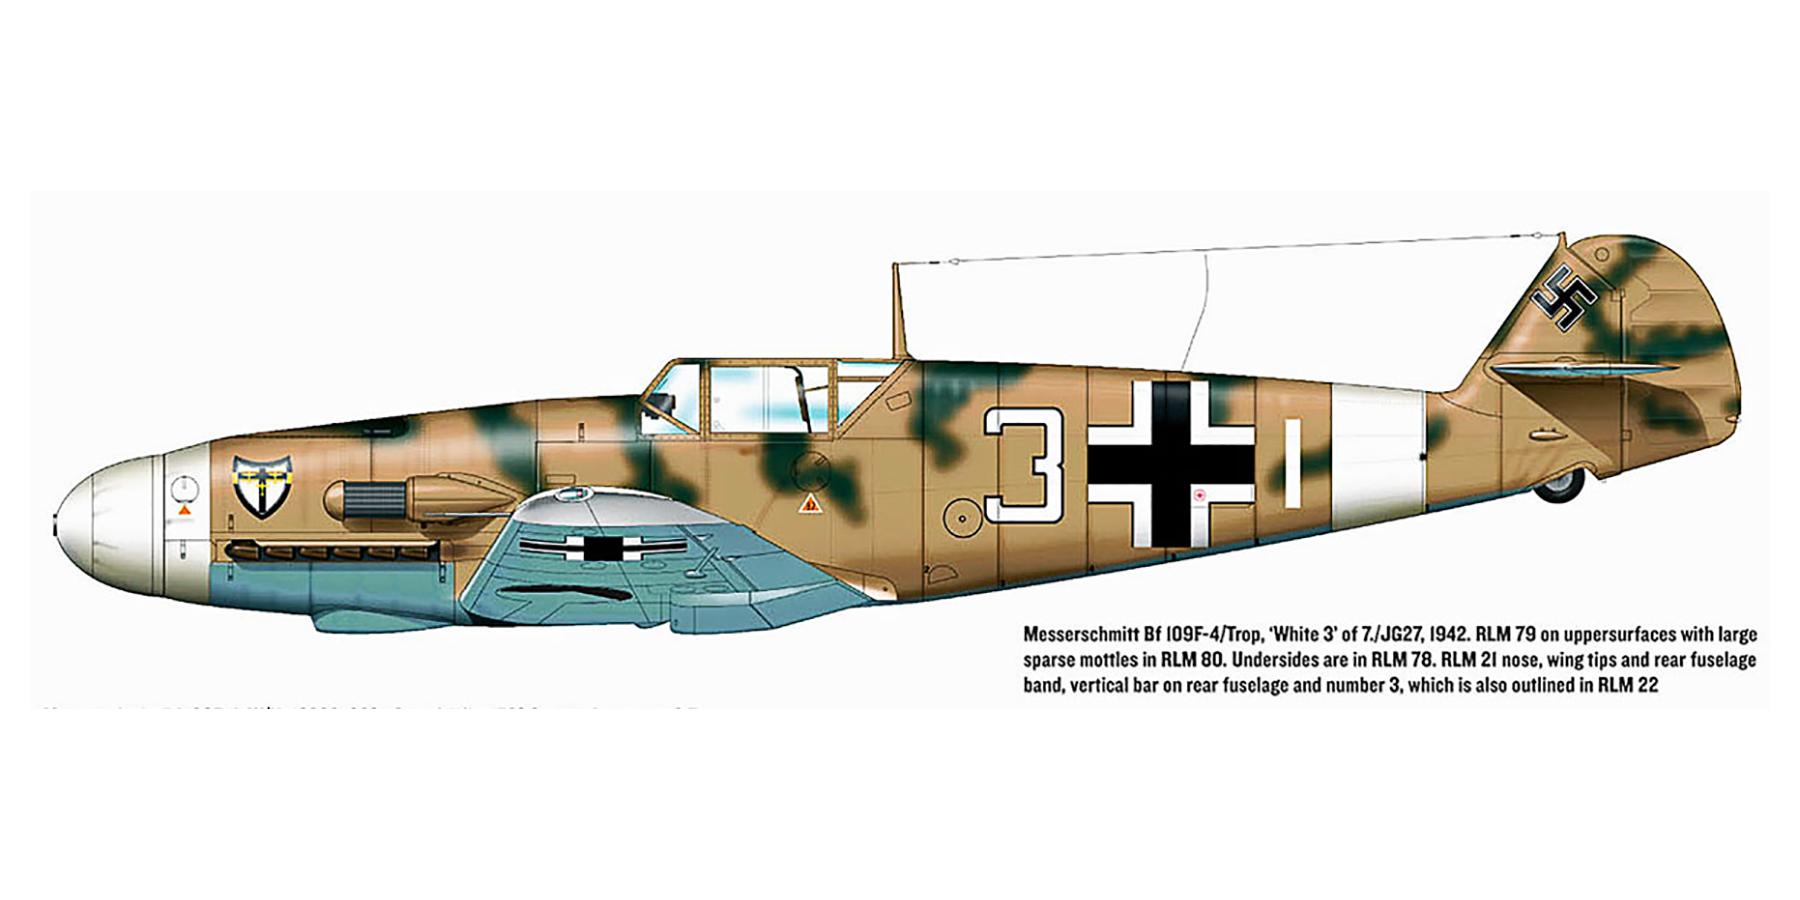 Messerschmitt Bf 109F4Trop 7.JG27 Whie 3 North Africa 1942 0B